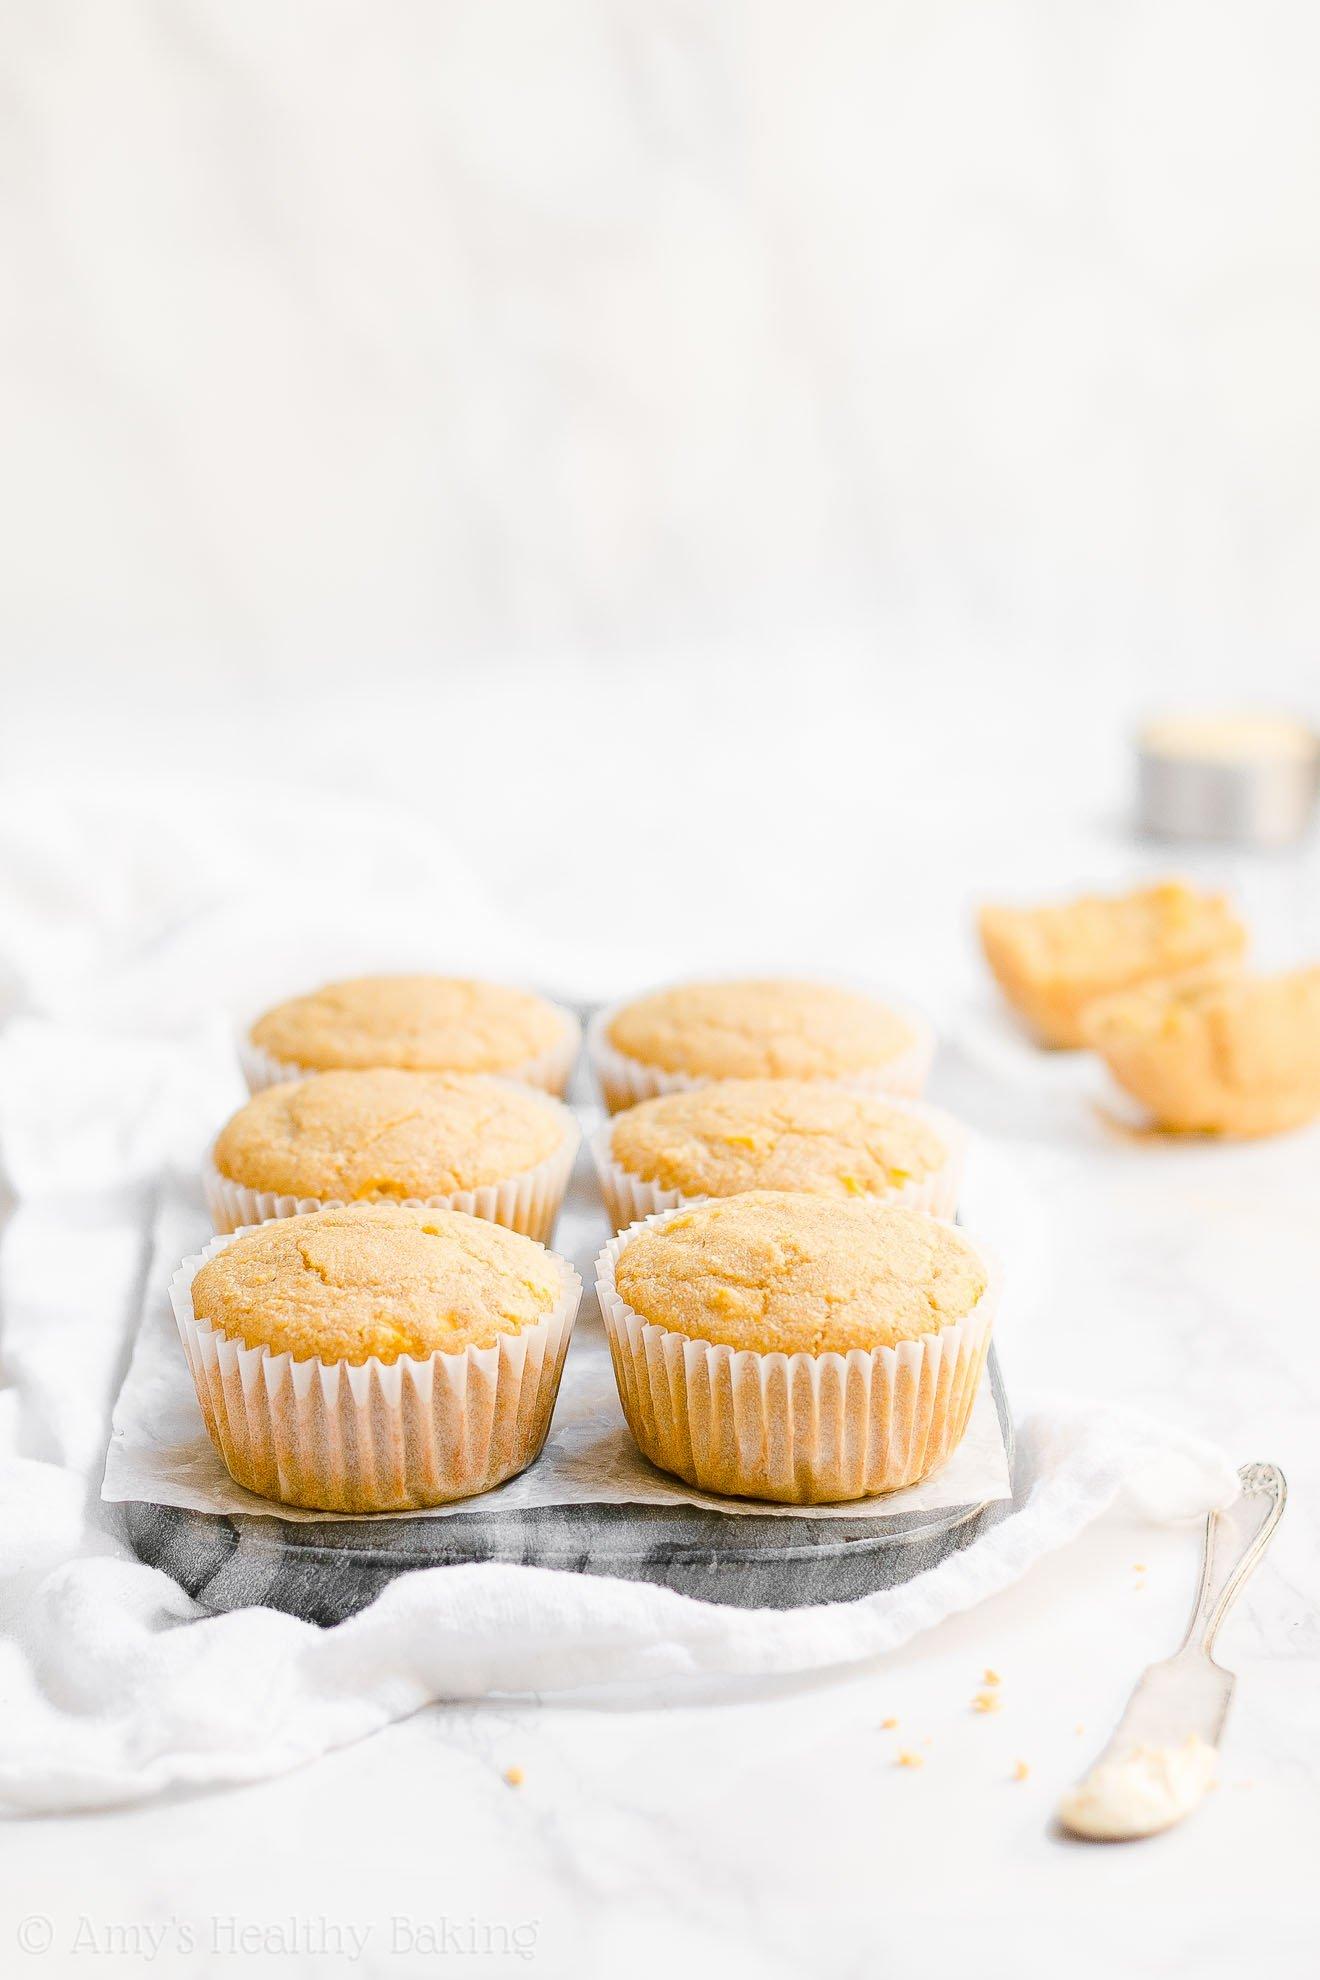 ULTIMATE Healthy Easy Low Calorie Gluten Free Cornbread Muffins